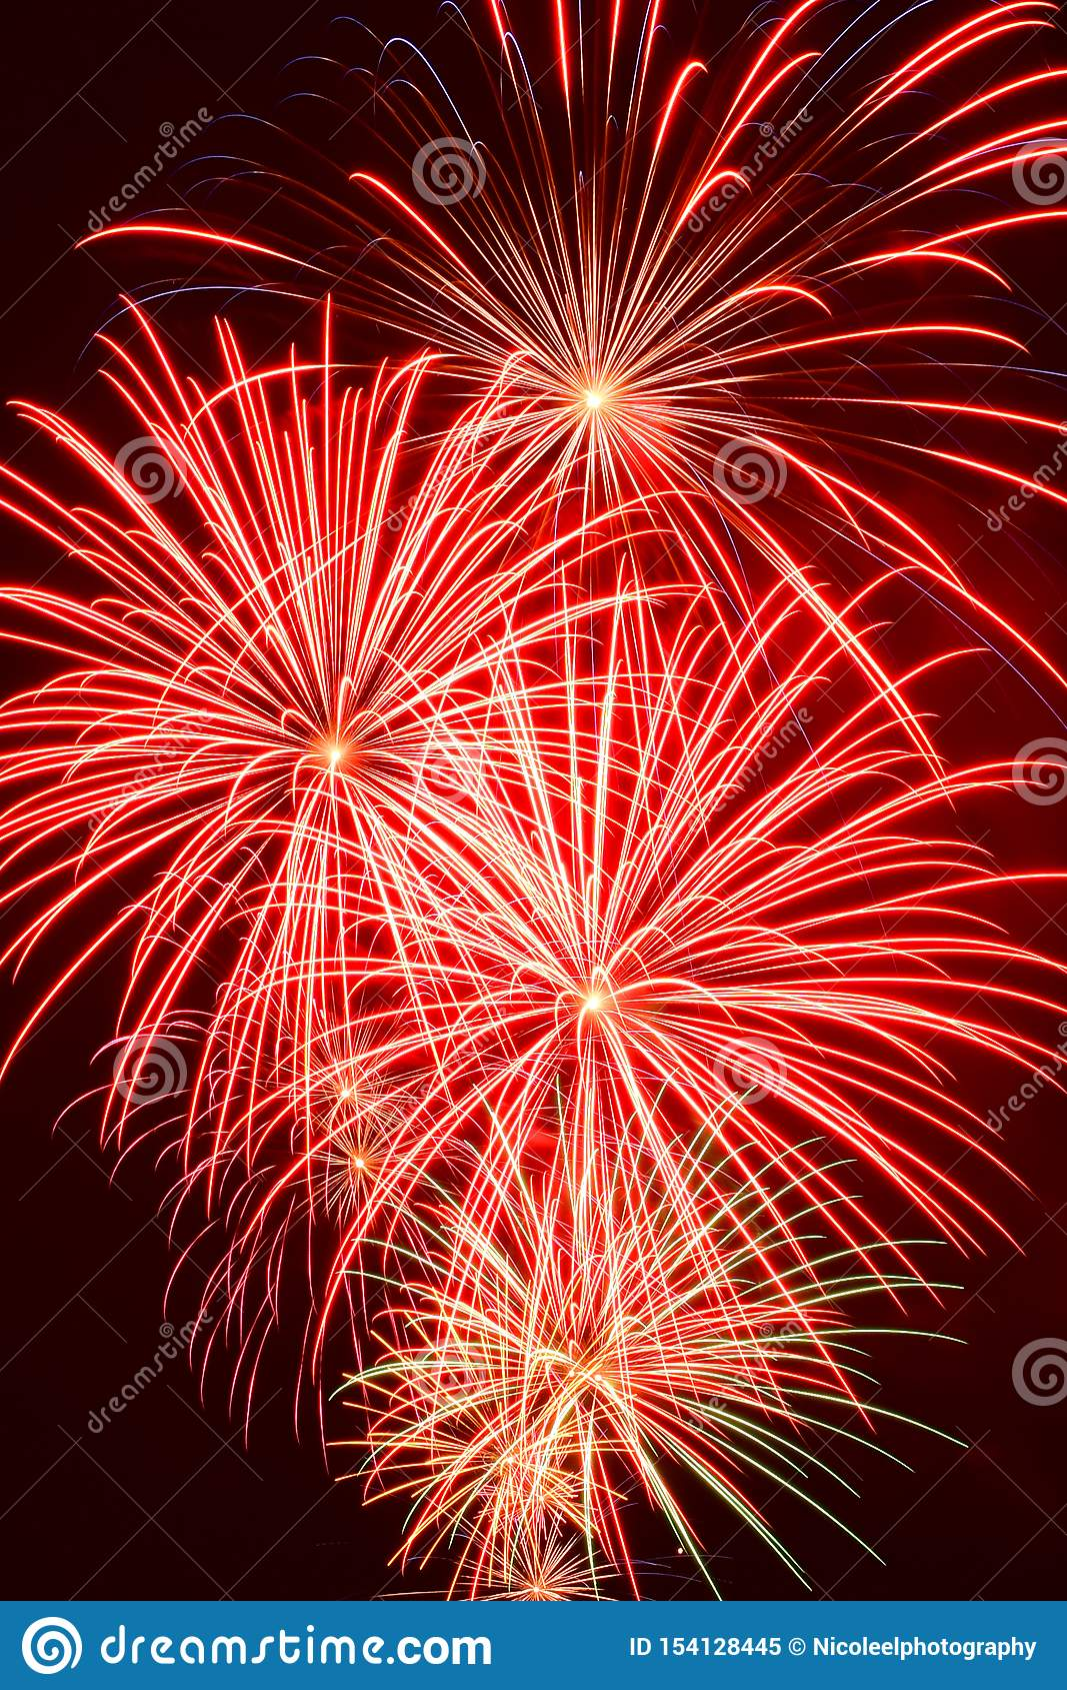 Array of Fireworks Burst in Portrait Orientation